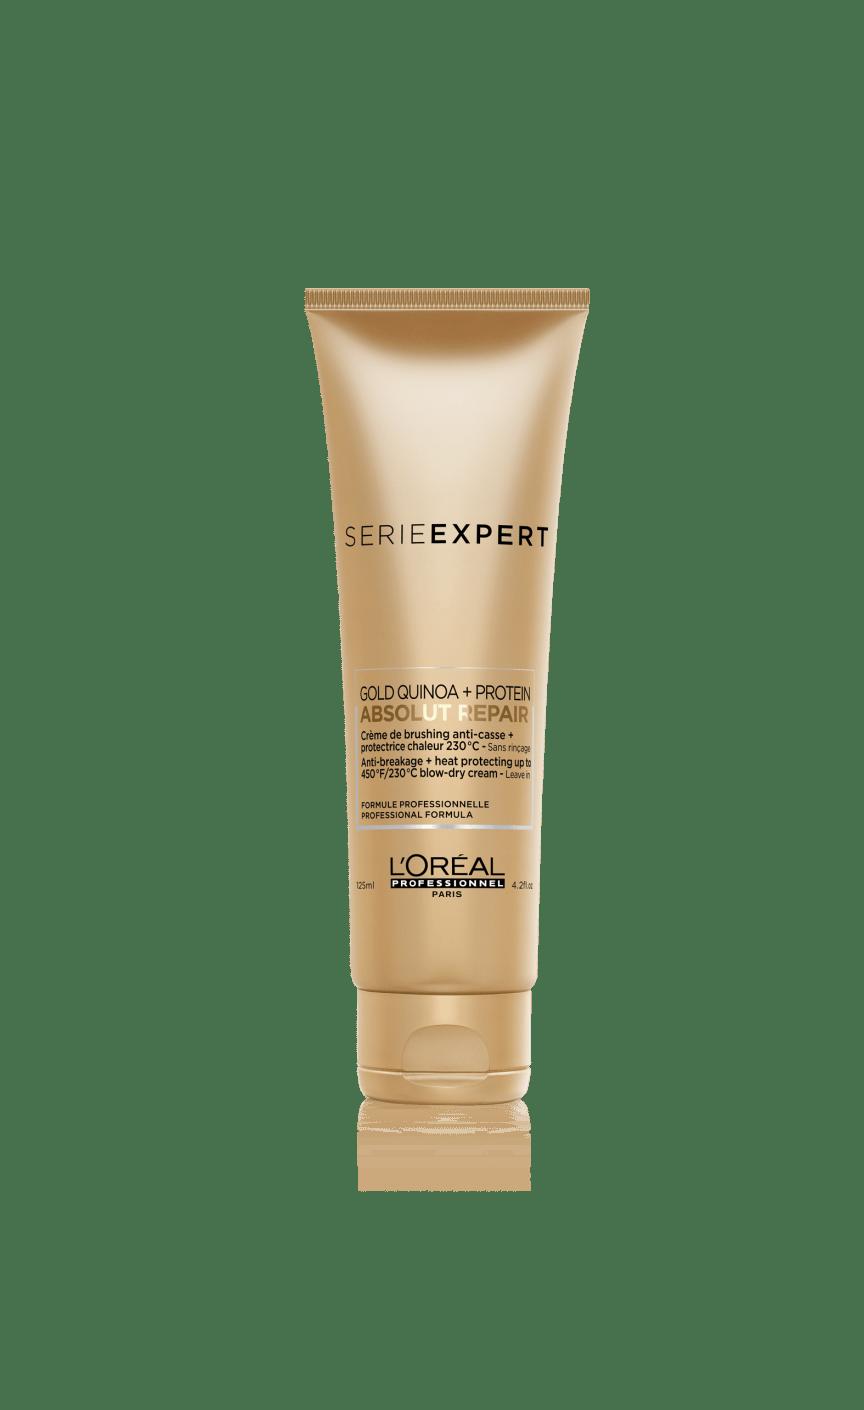 SERIE EXPERT Absolut Repair Blow Dry Cream 190 ml